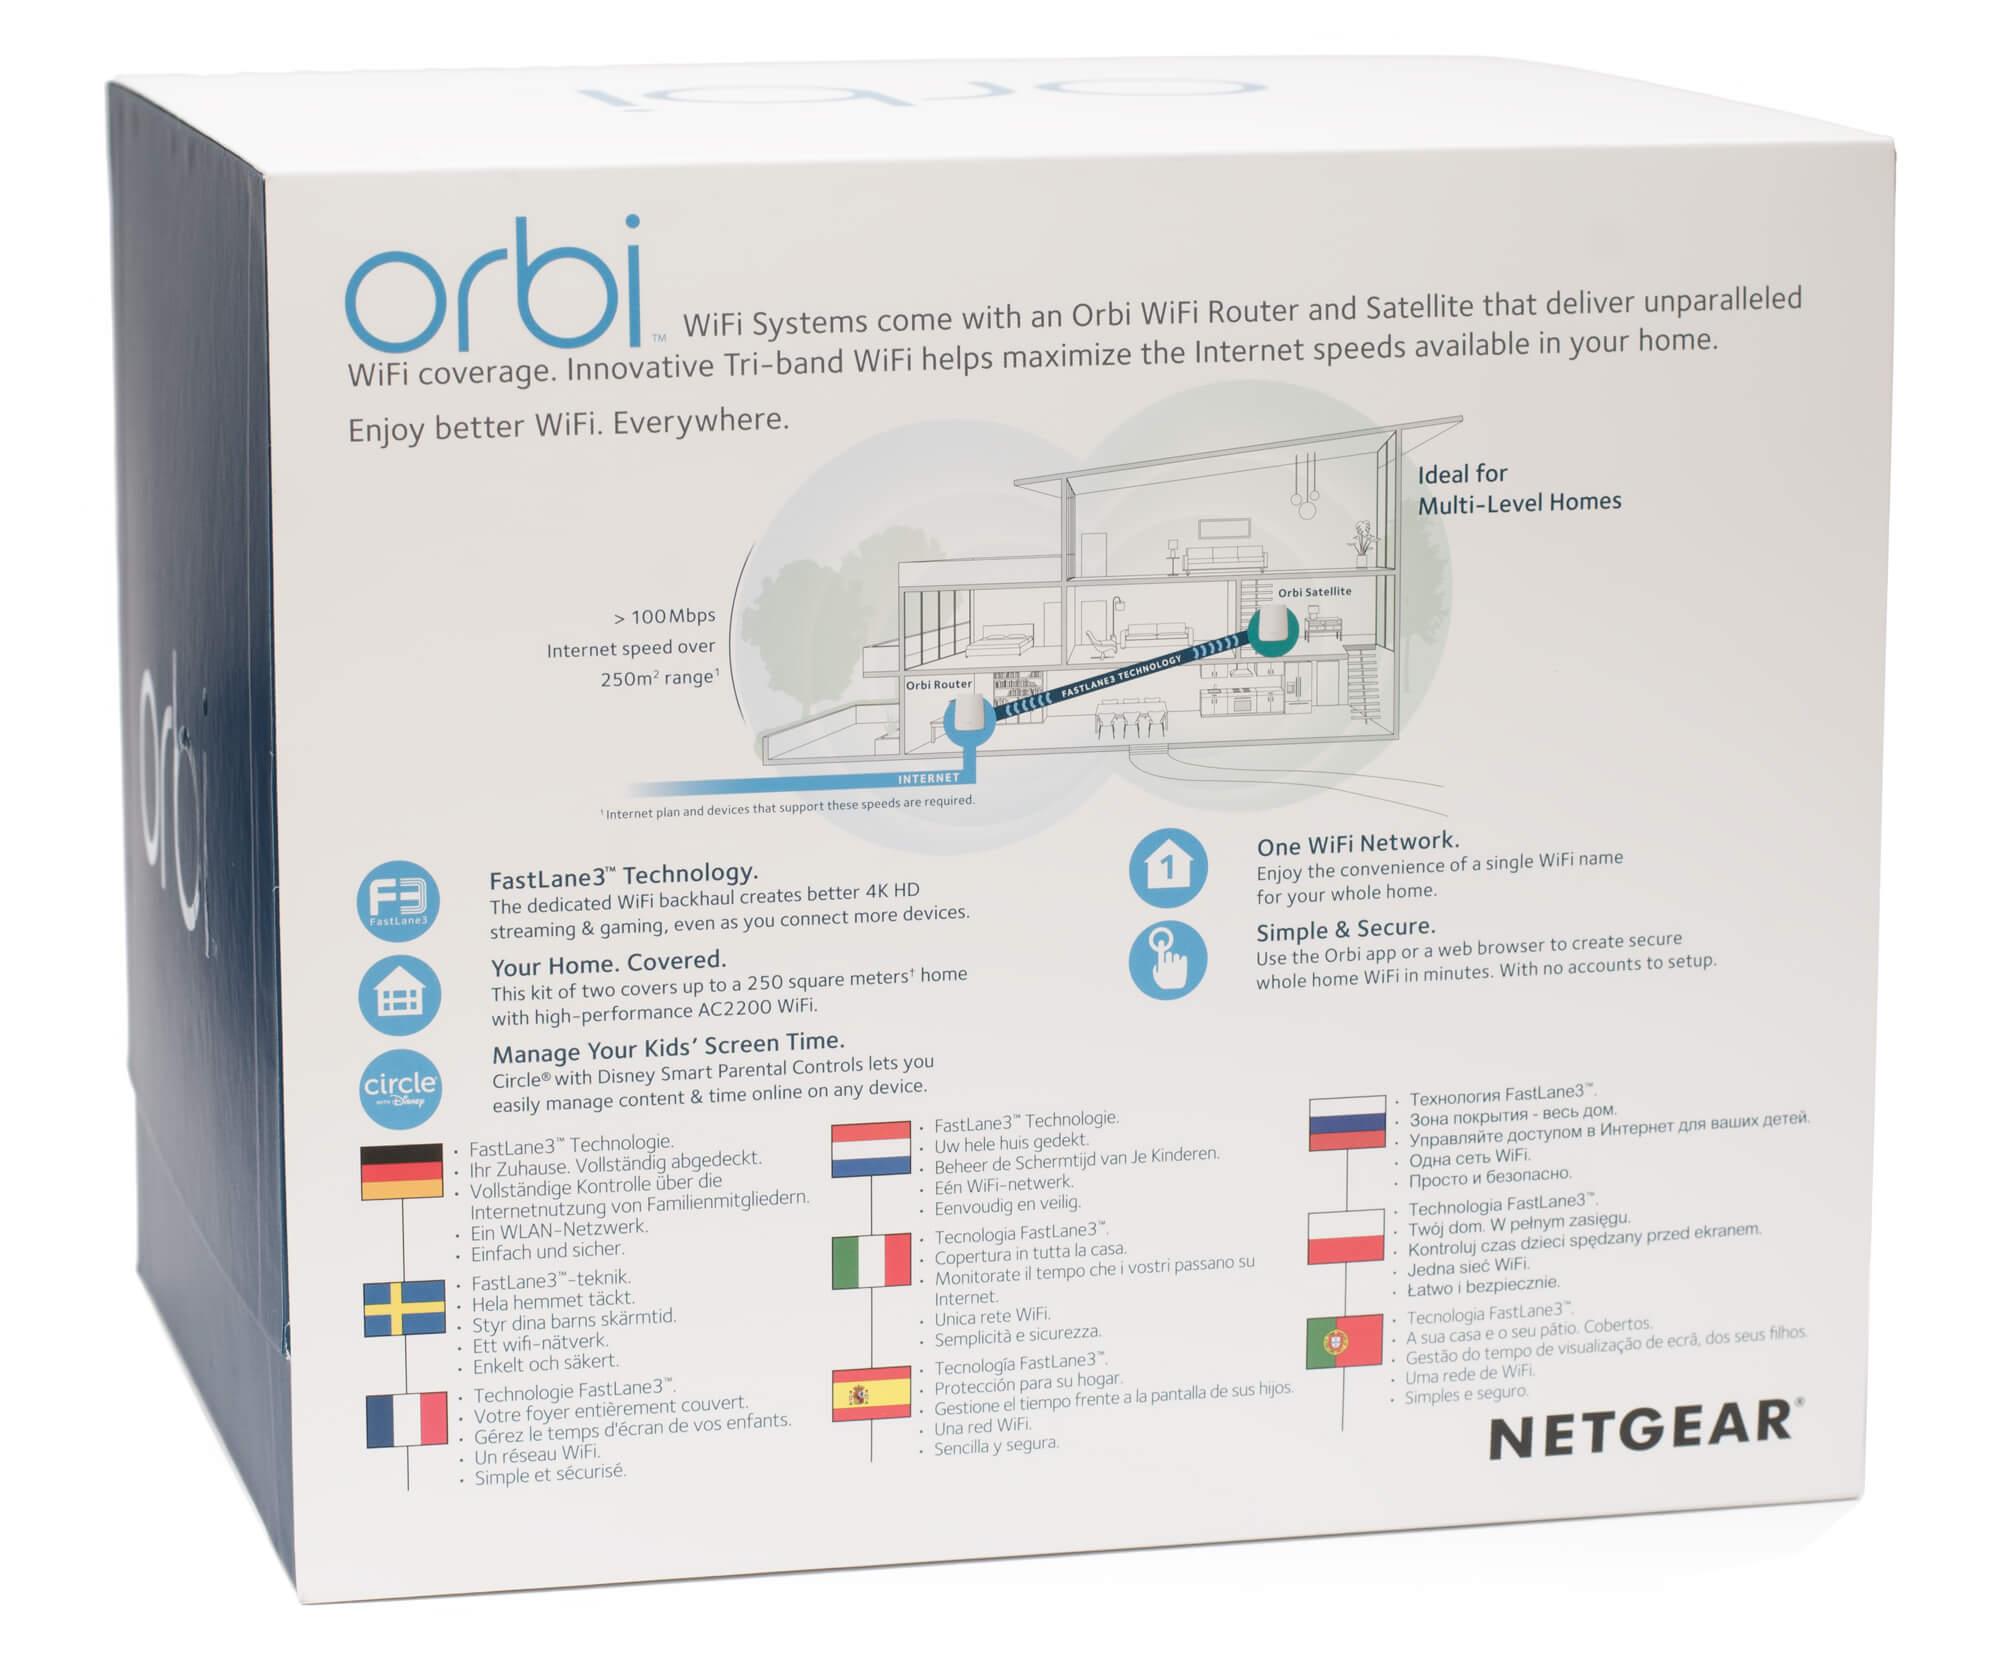 Netgear Orbi im Test (RBK20) - Smart Home One